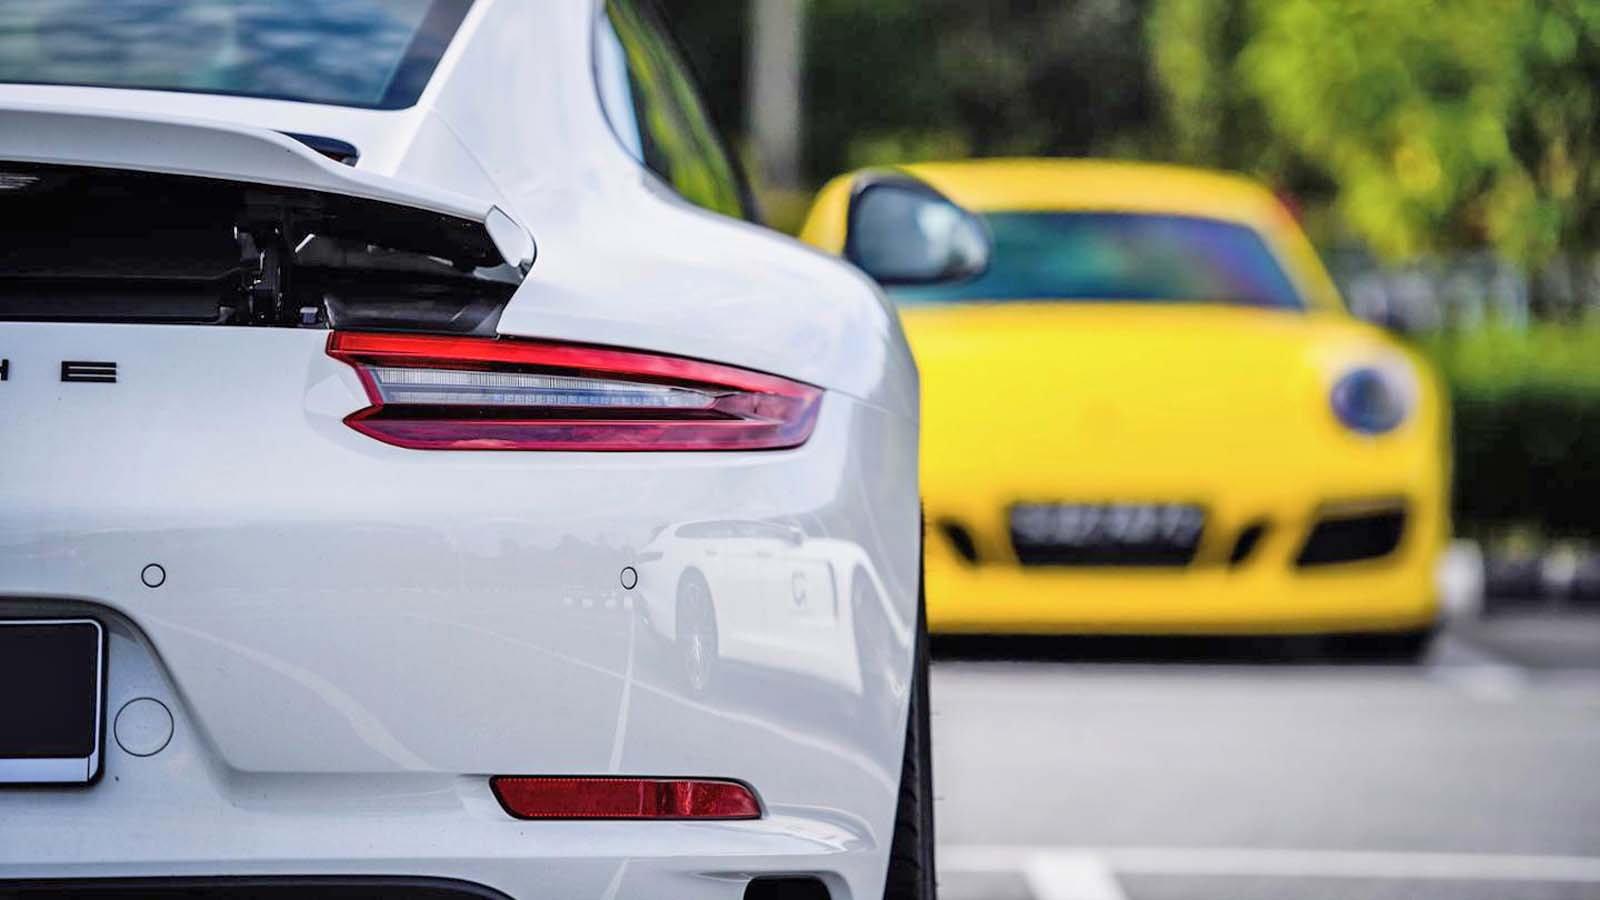 Porsche Partners with Turo for VIP Program